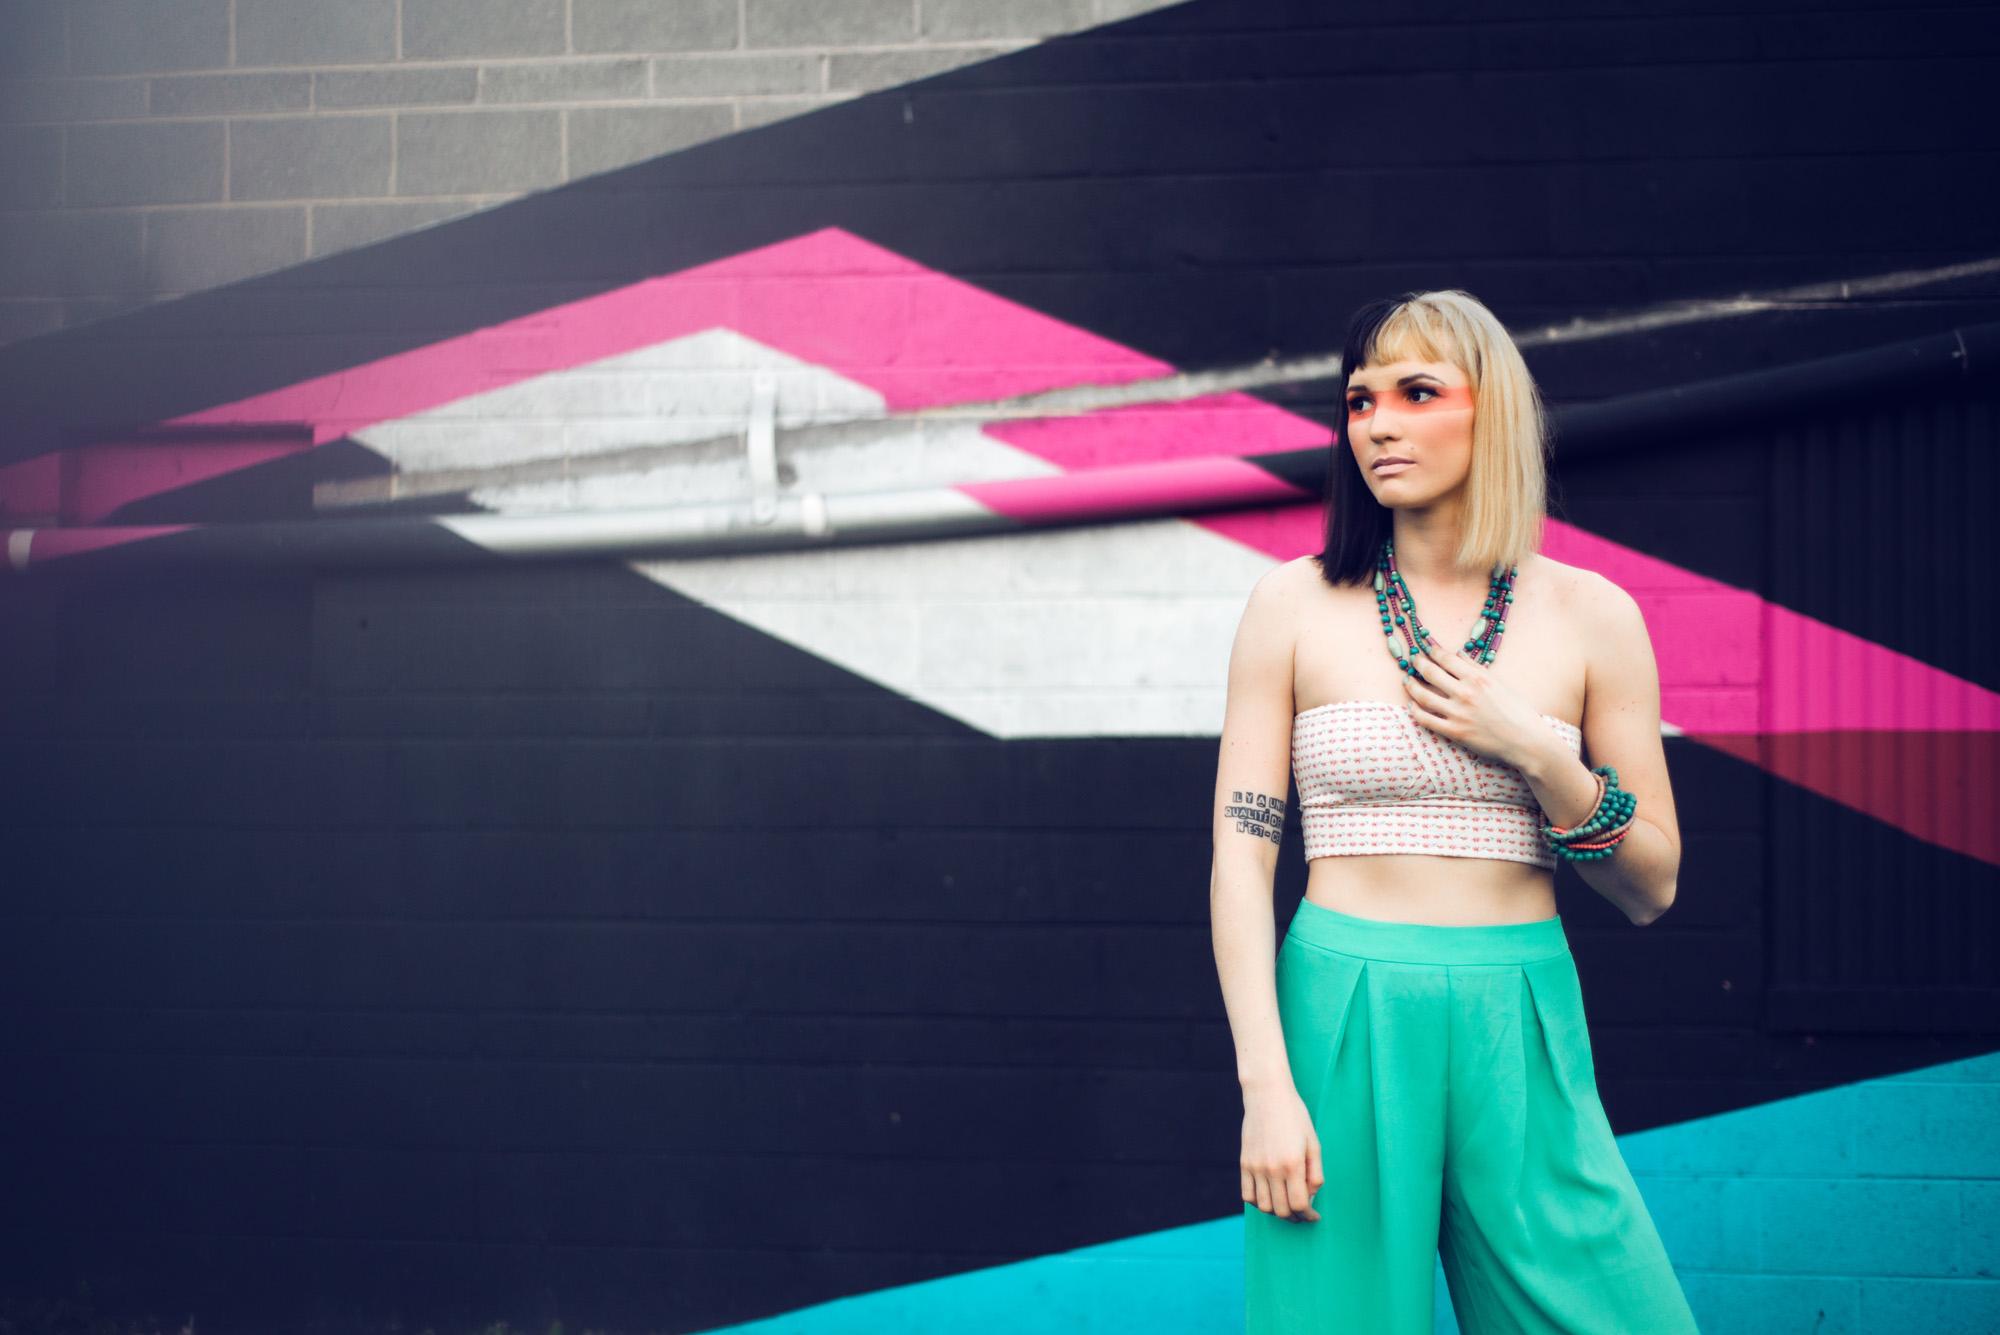 Sarah Hooker Photography | Color Fanatic: Play Every Day, Model Gabriela MacArdle, MUA Tia Hixon, Asheville NC